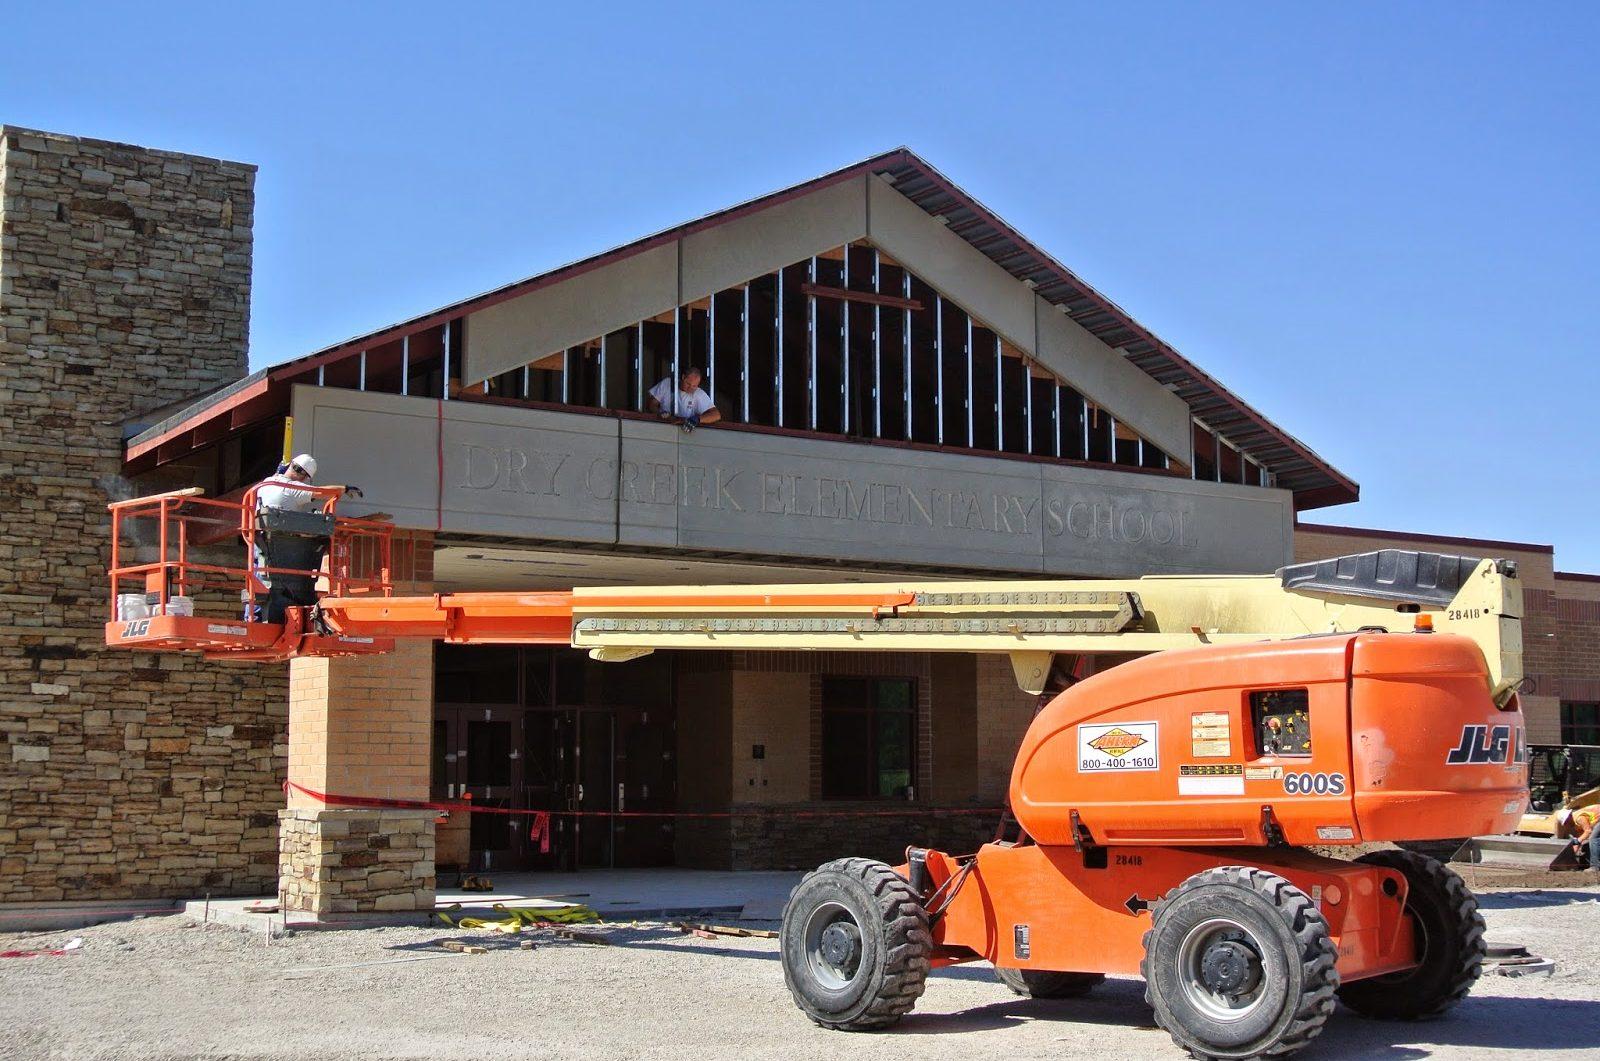 Installation of GFRC Stone Panels   Construction Site: Dry Creek Elementary School, Lehi, UT